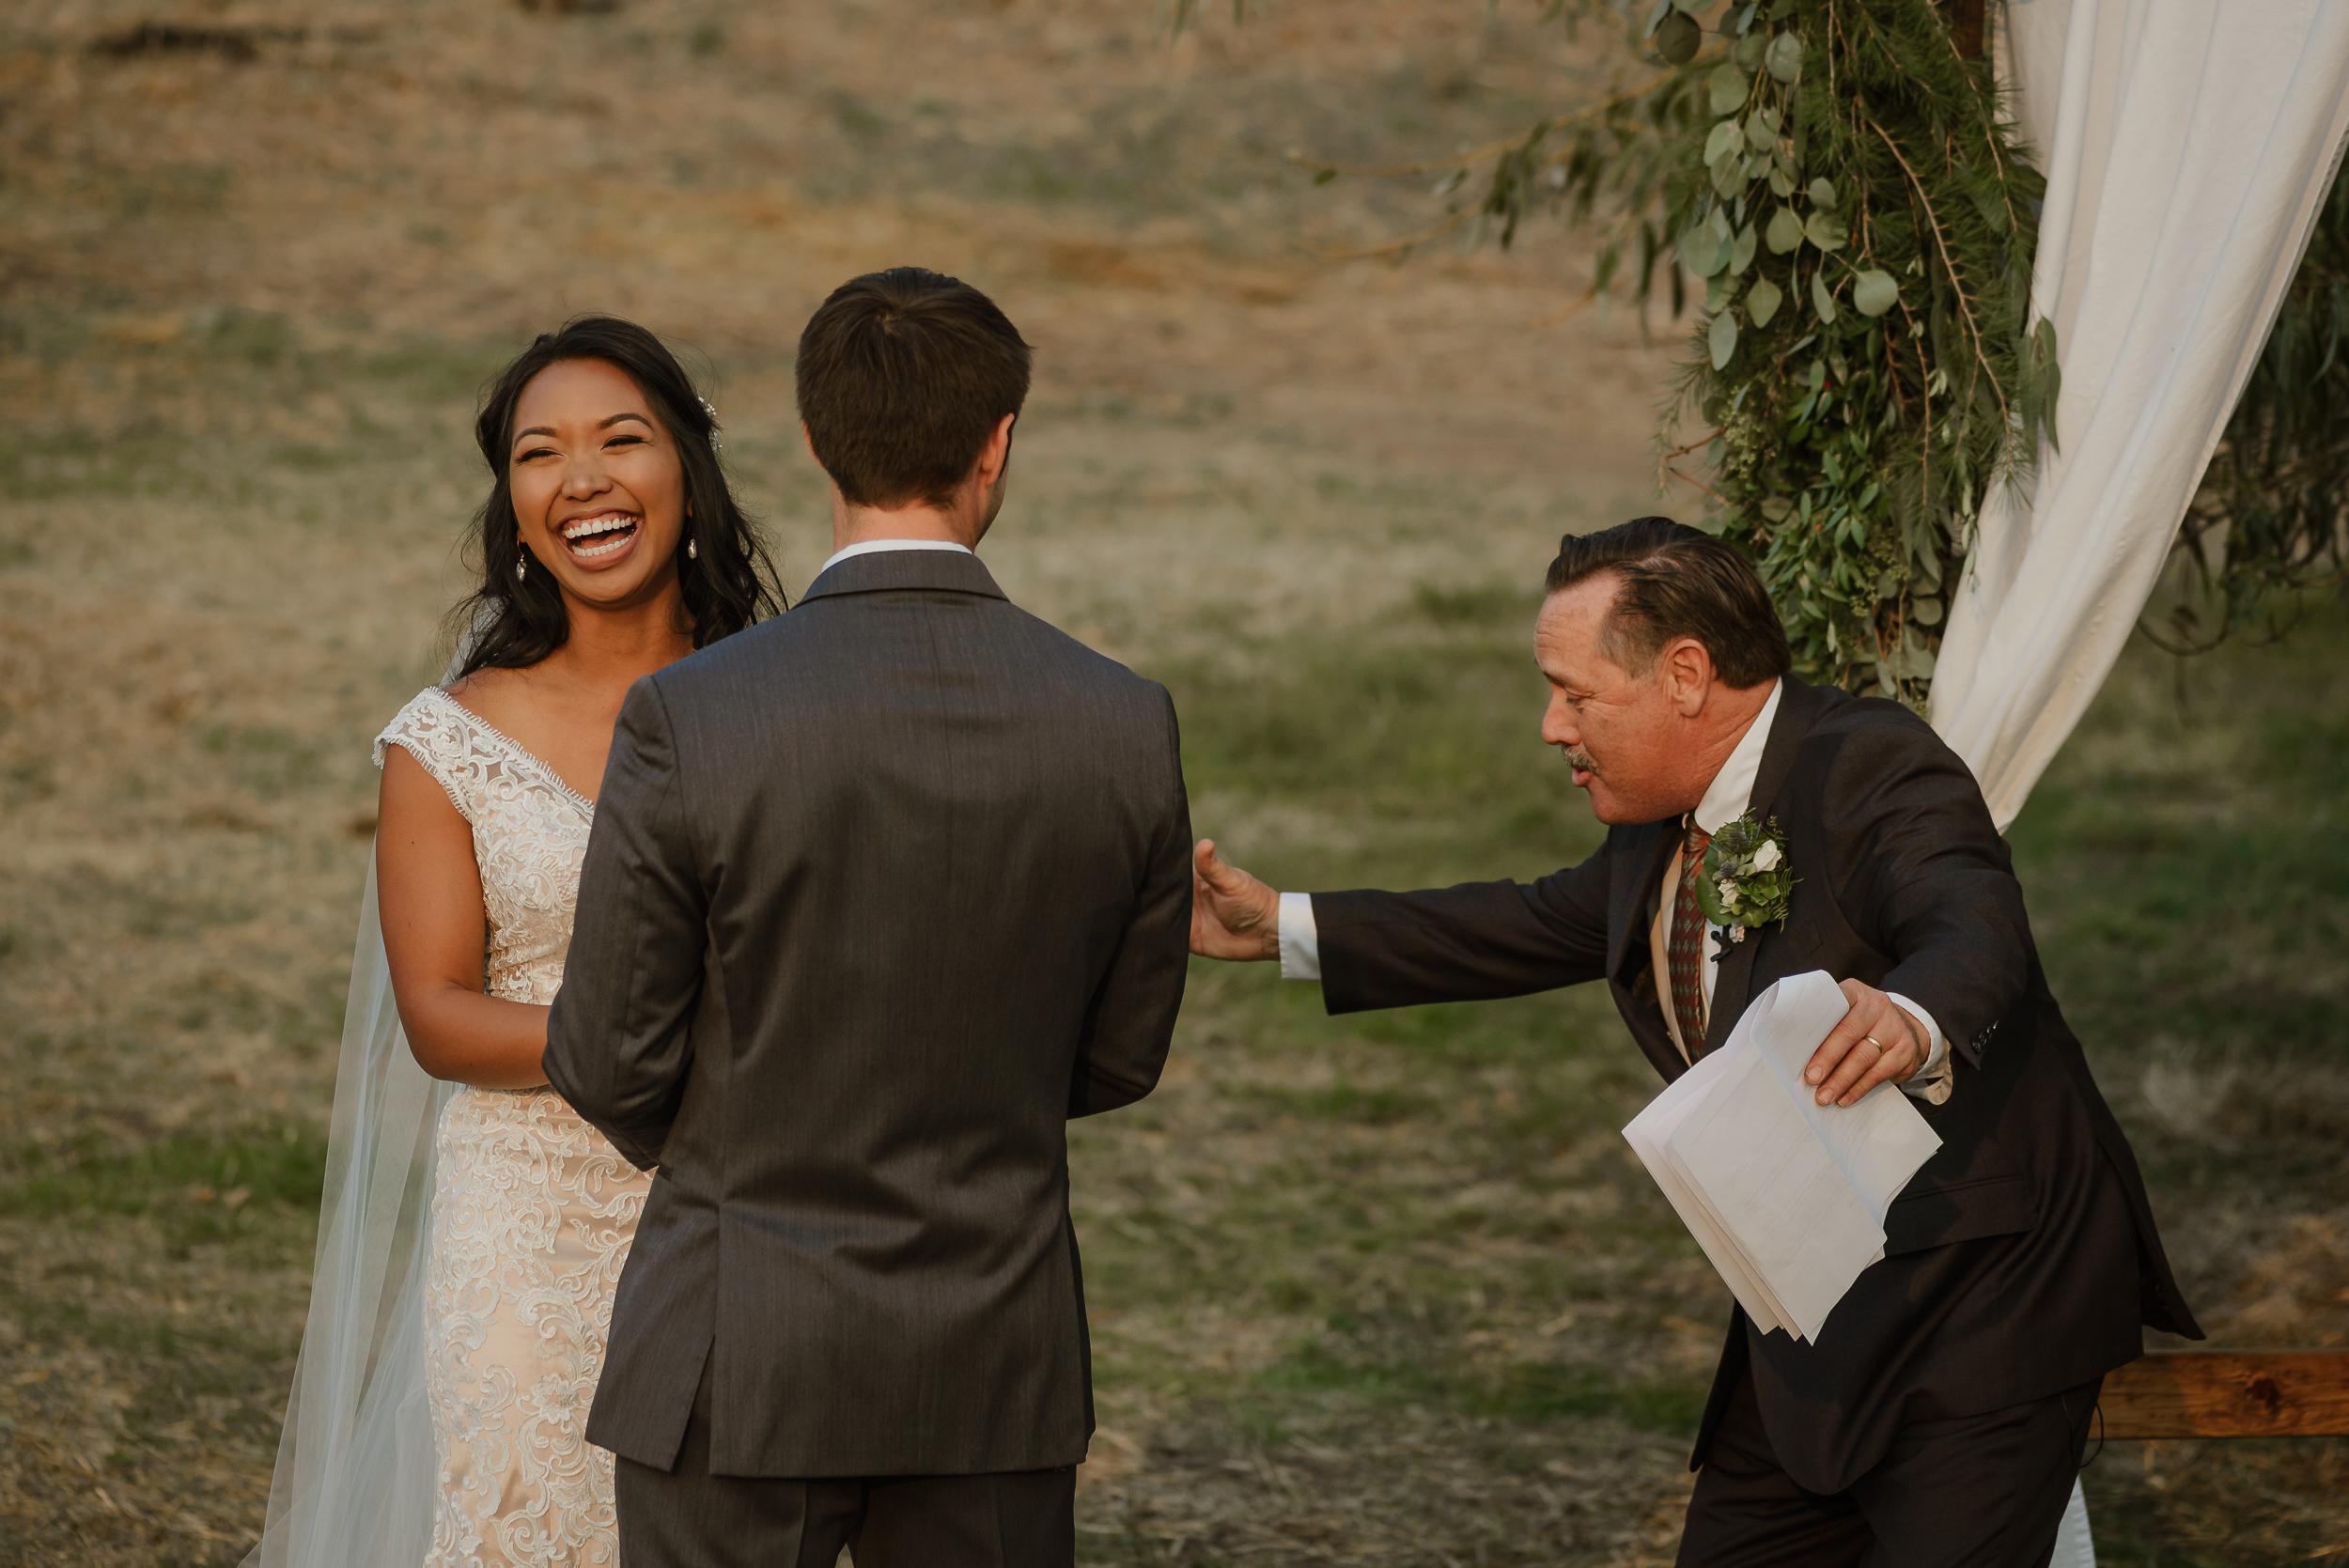 043marin-petaluma-backyard-wedding-vivianchen-269.jpg